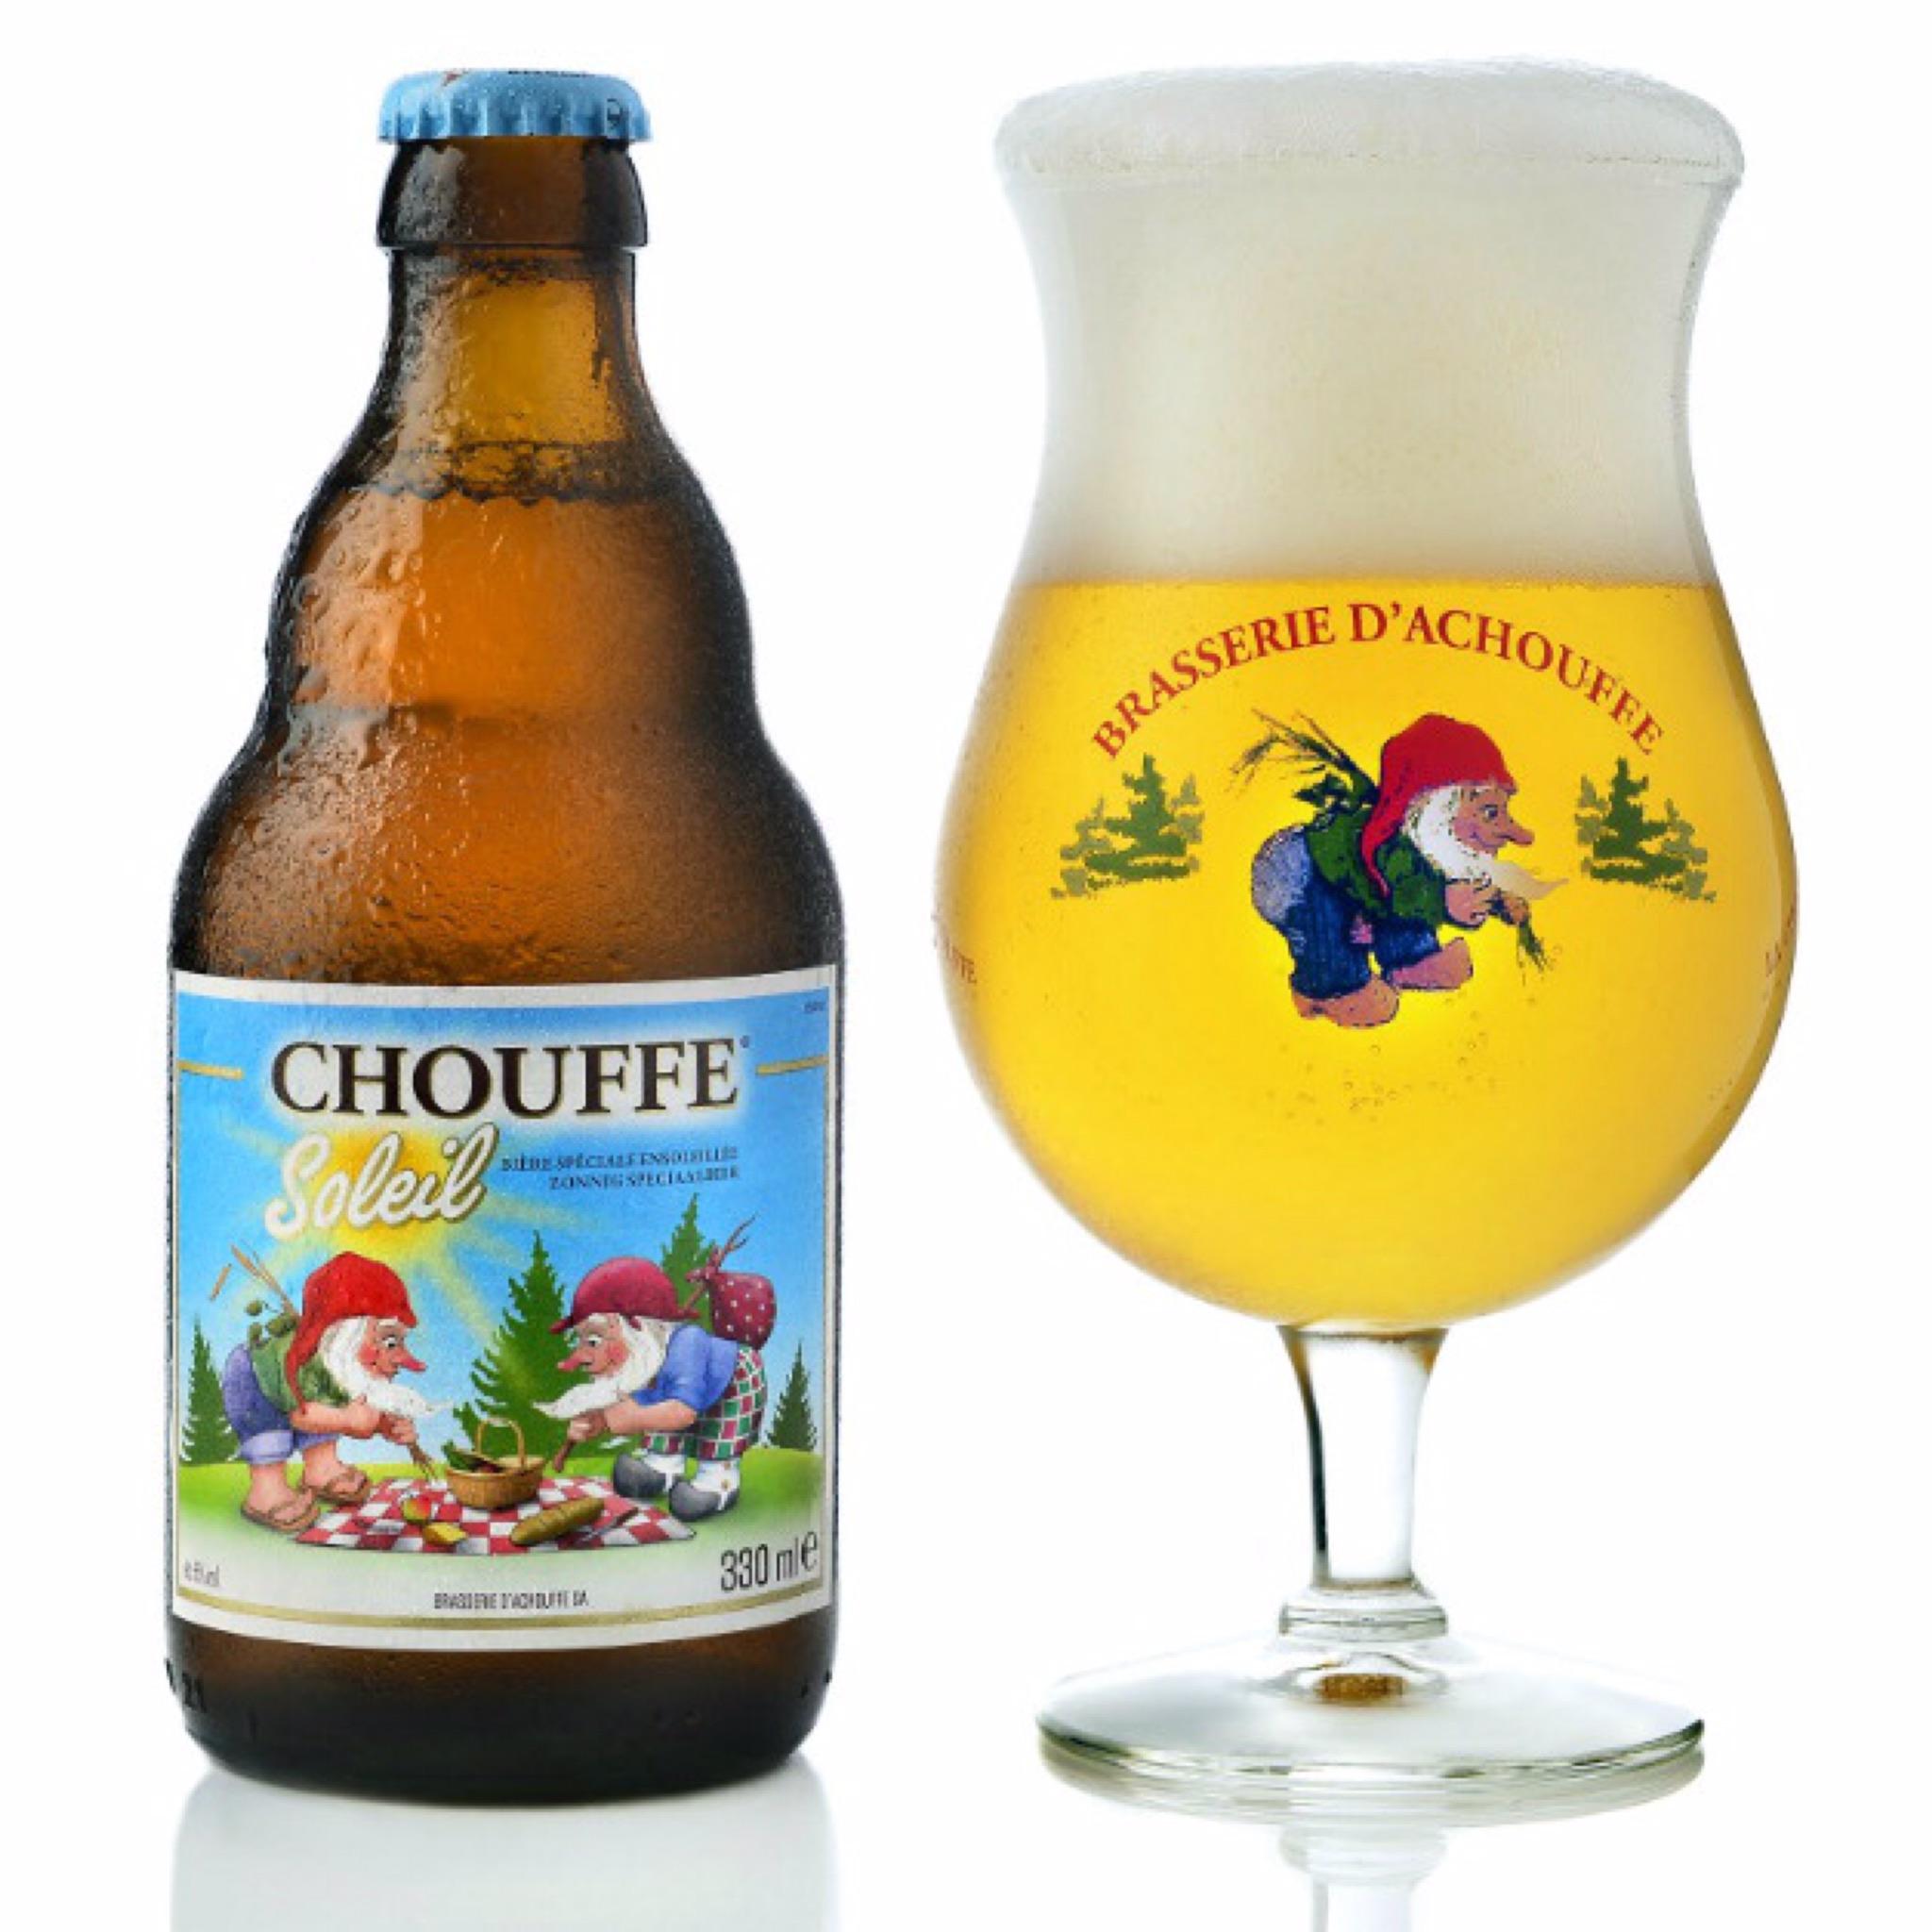 La Chouffe Soleil Blond 6% 330ml